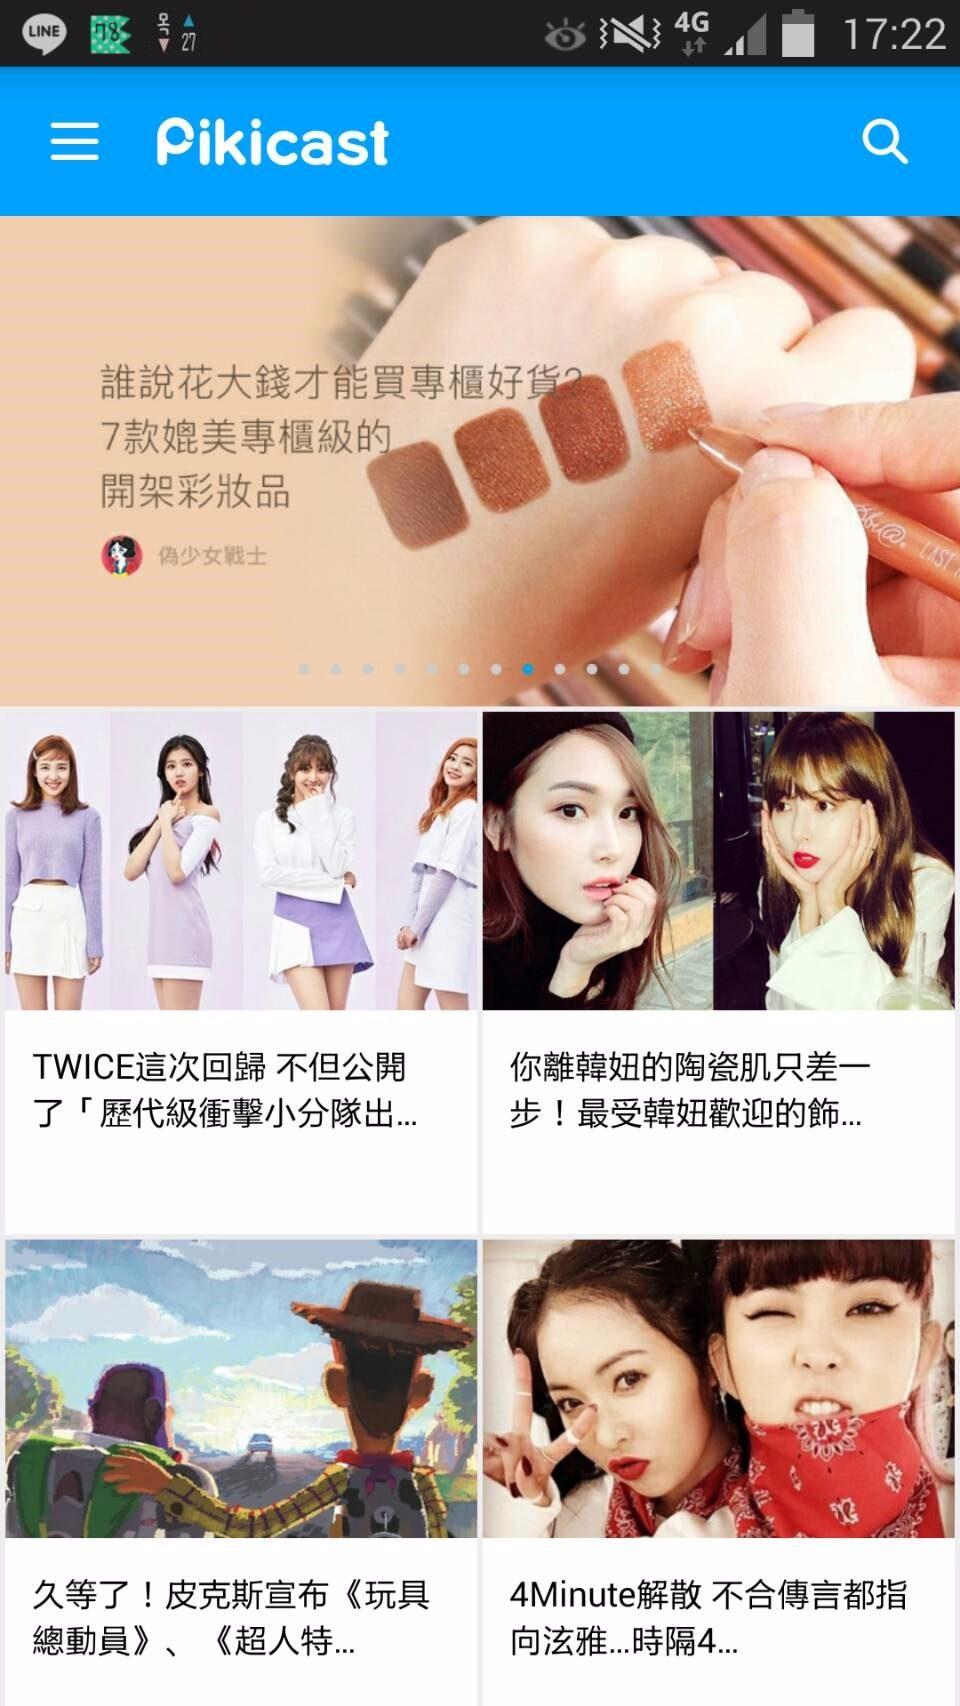 ▶Pikicast 欸欸絕對不是宅精靈自誇打廣告啊 除了韓星資訊、有趣的新聞主題之外.....